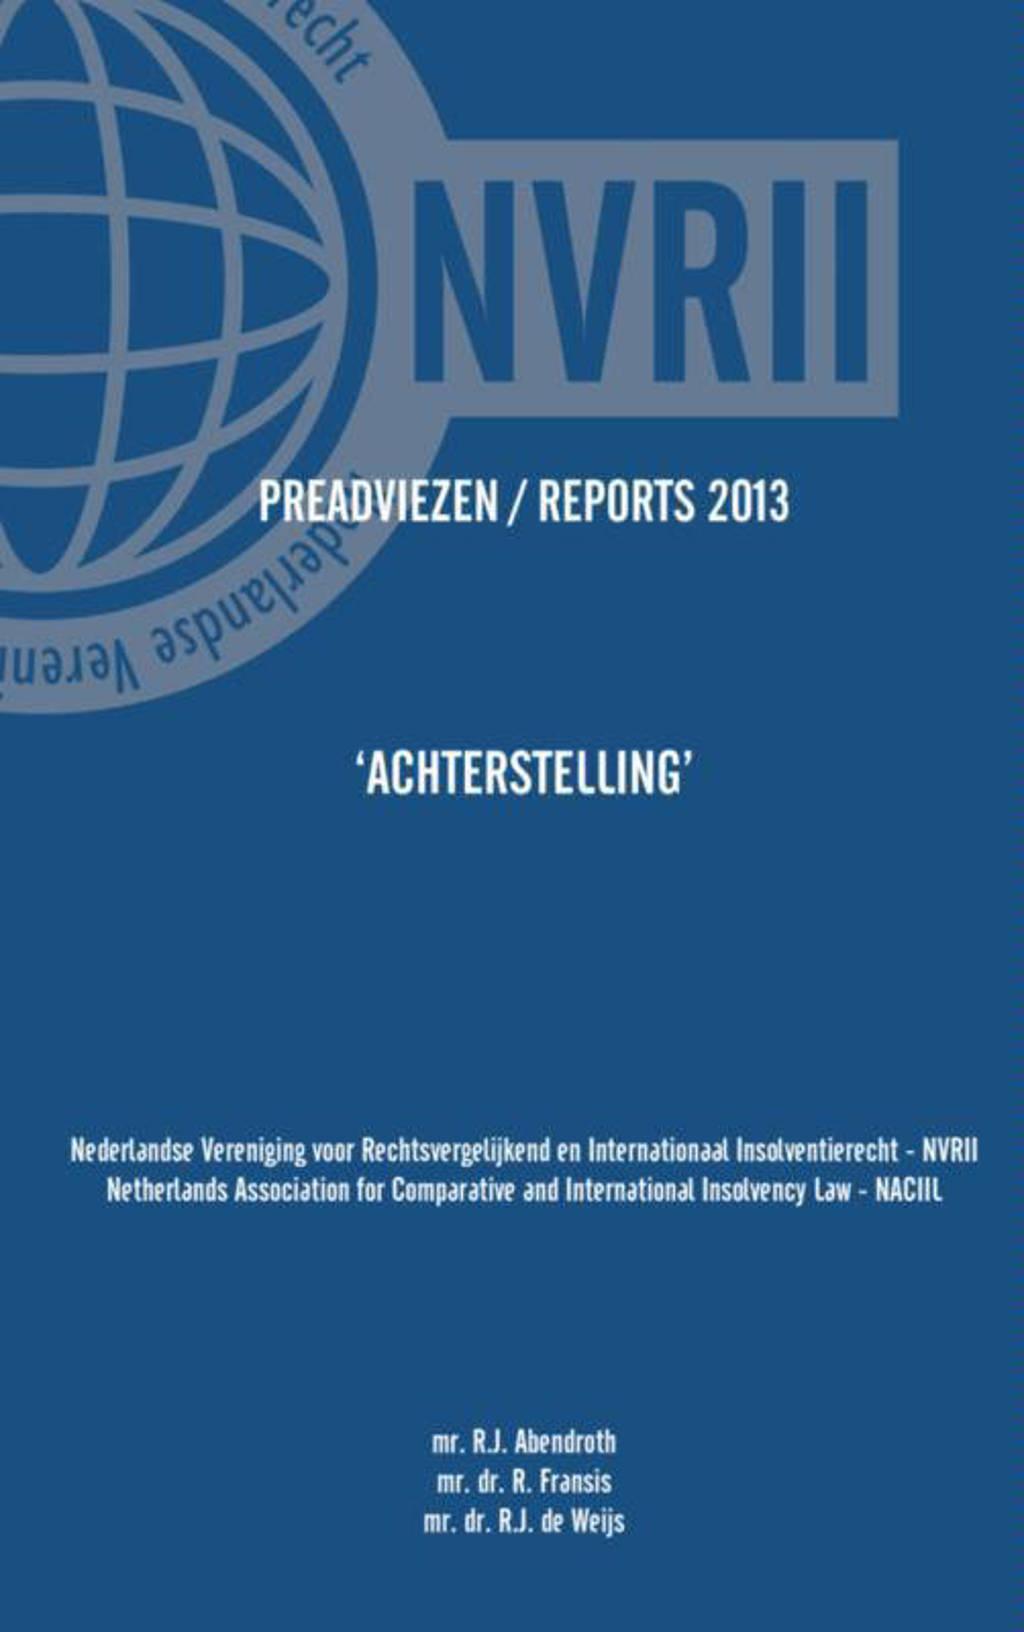 Preadviezen Reports 2013 NVRII - NACIIL